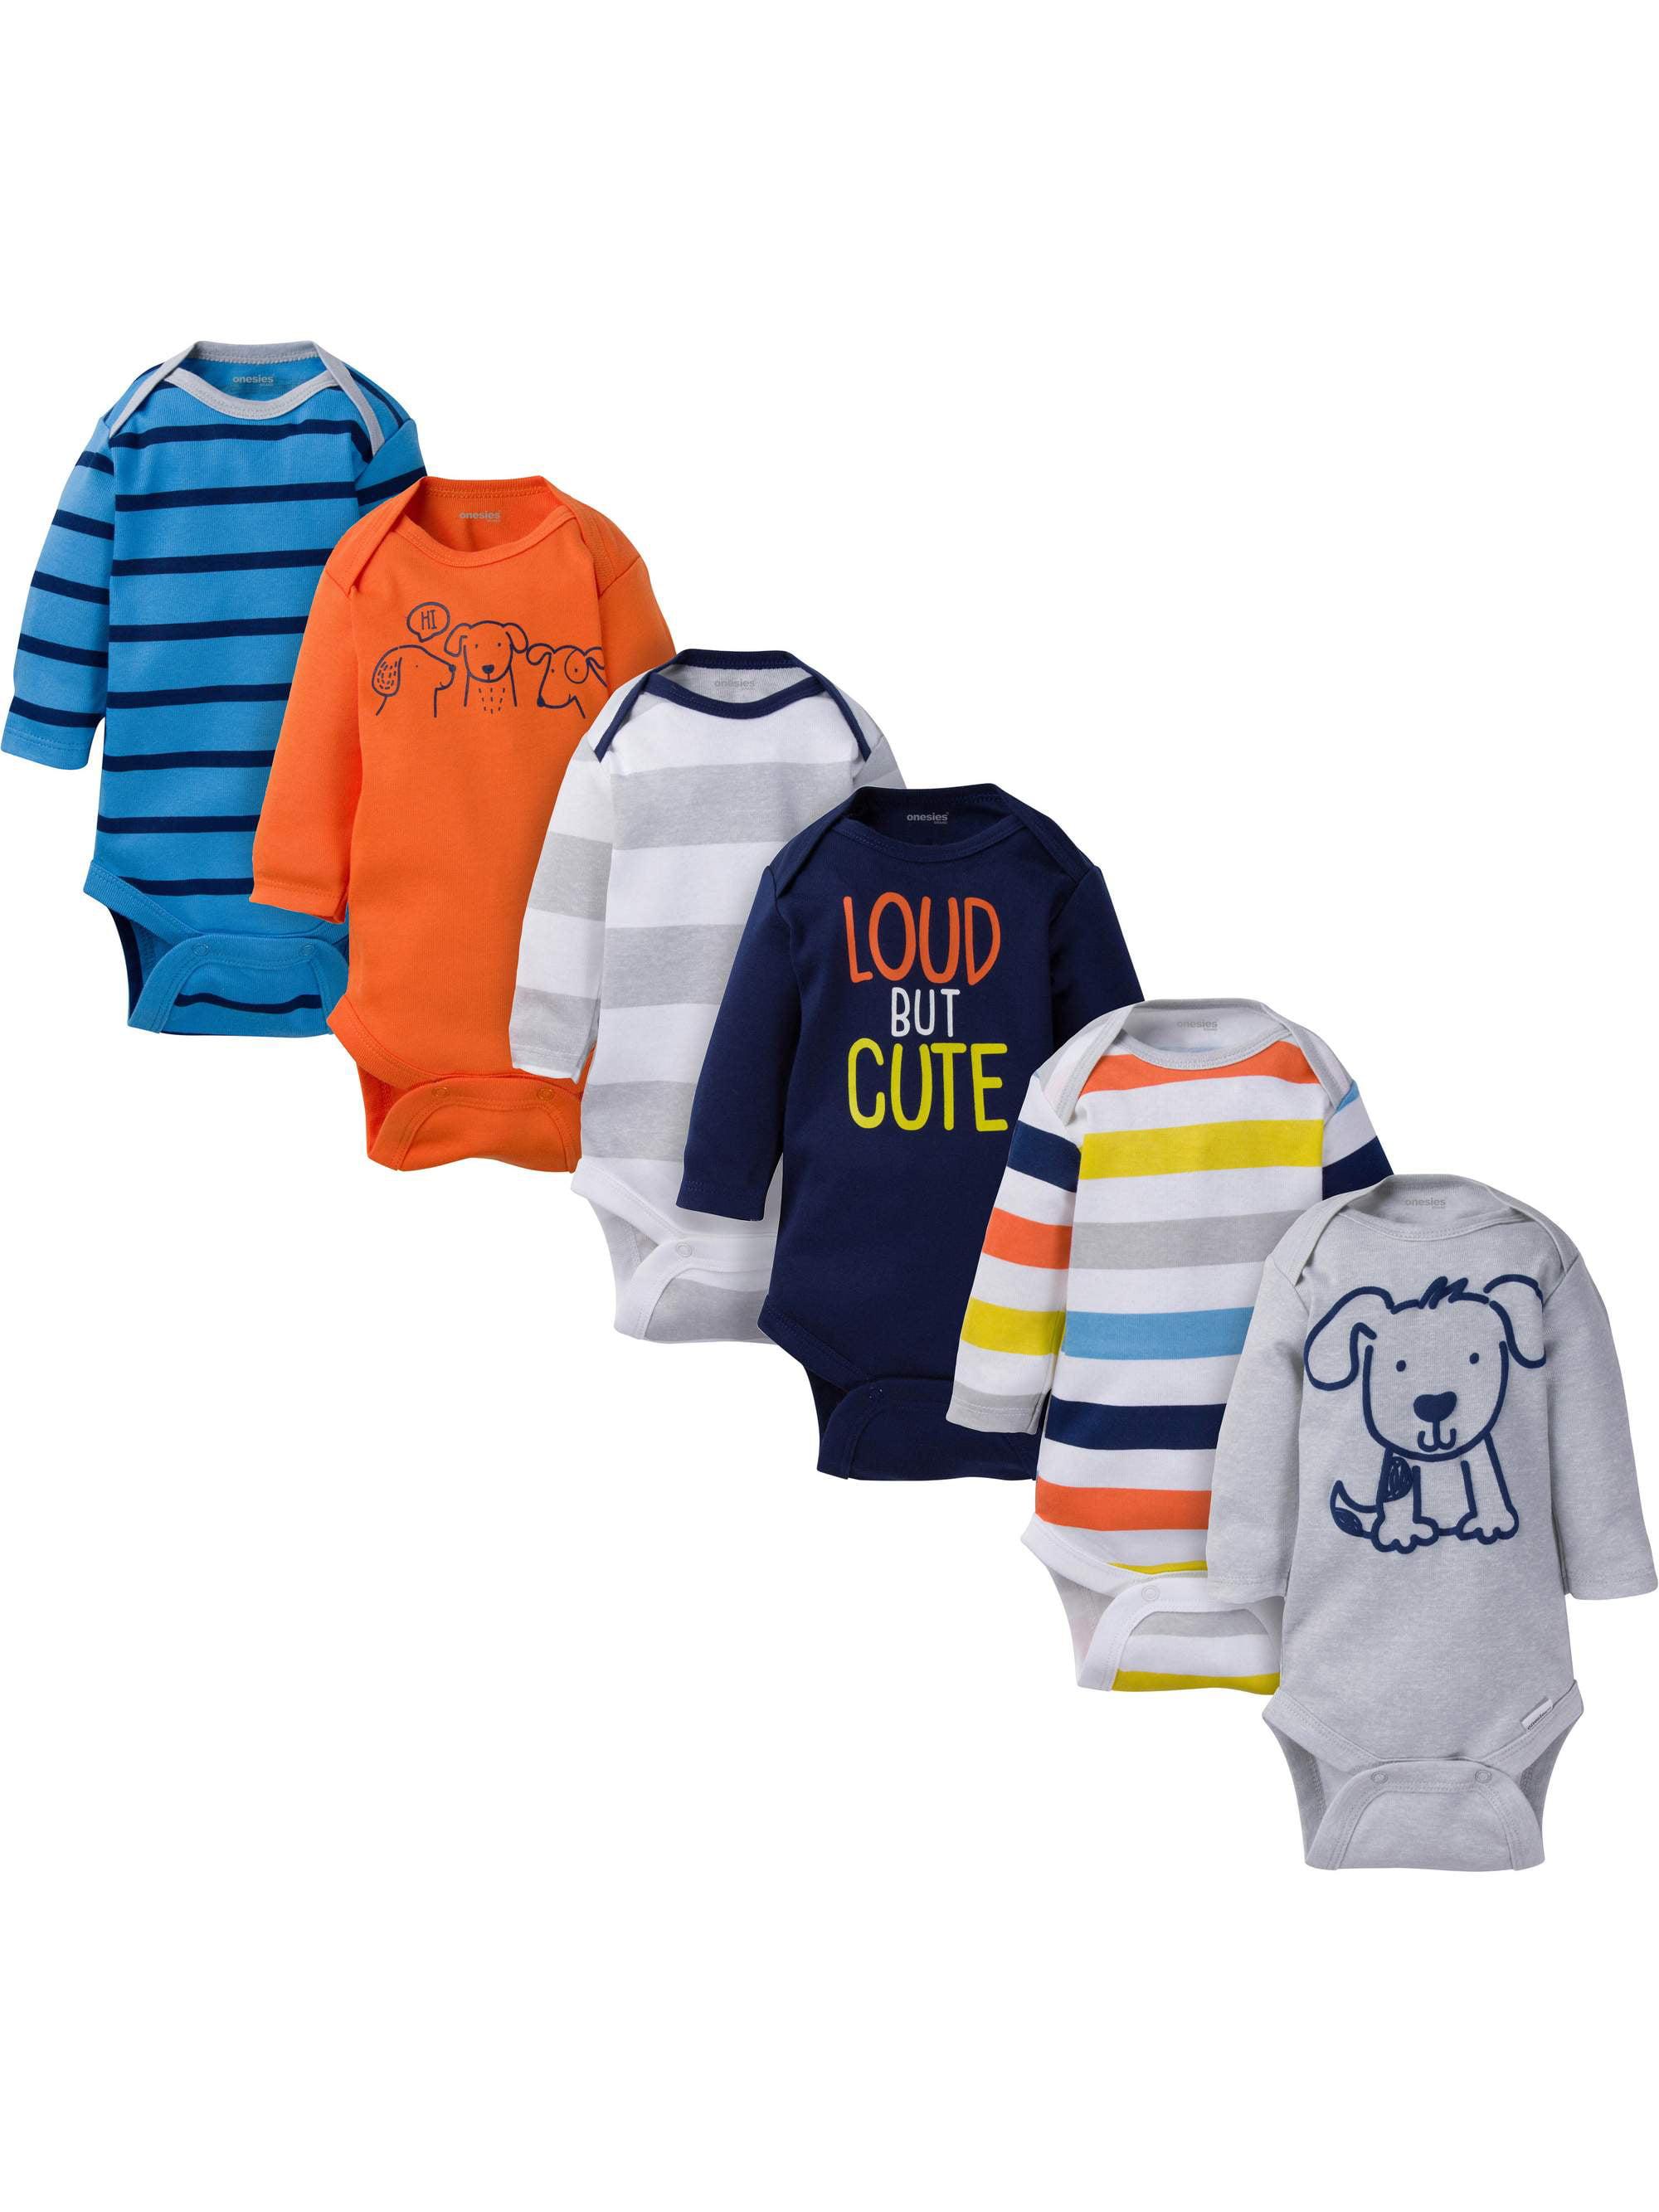 Assorted Long Sleeve Bodysuits Set, 6pk (Baby Boy)